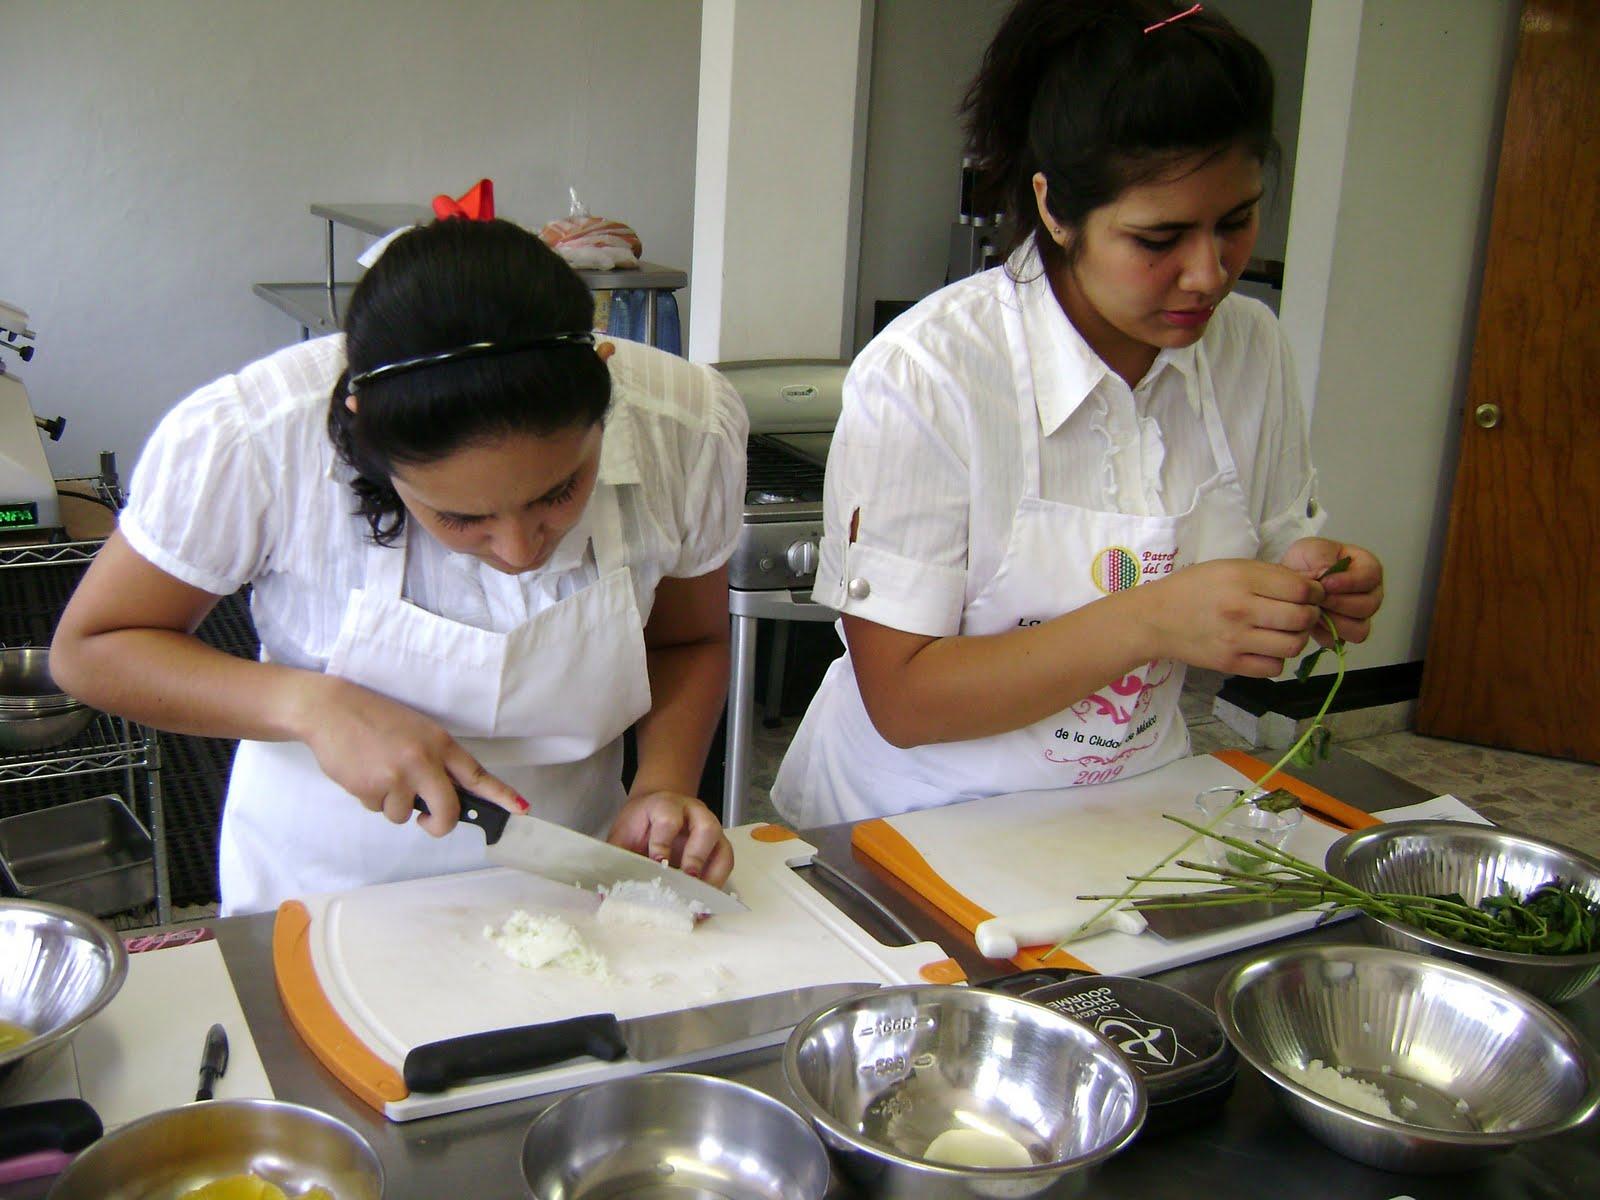 Colegio thotal gourmet calse de cocina francesa for Cocina francesa gourmet